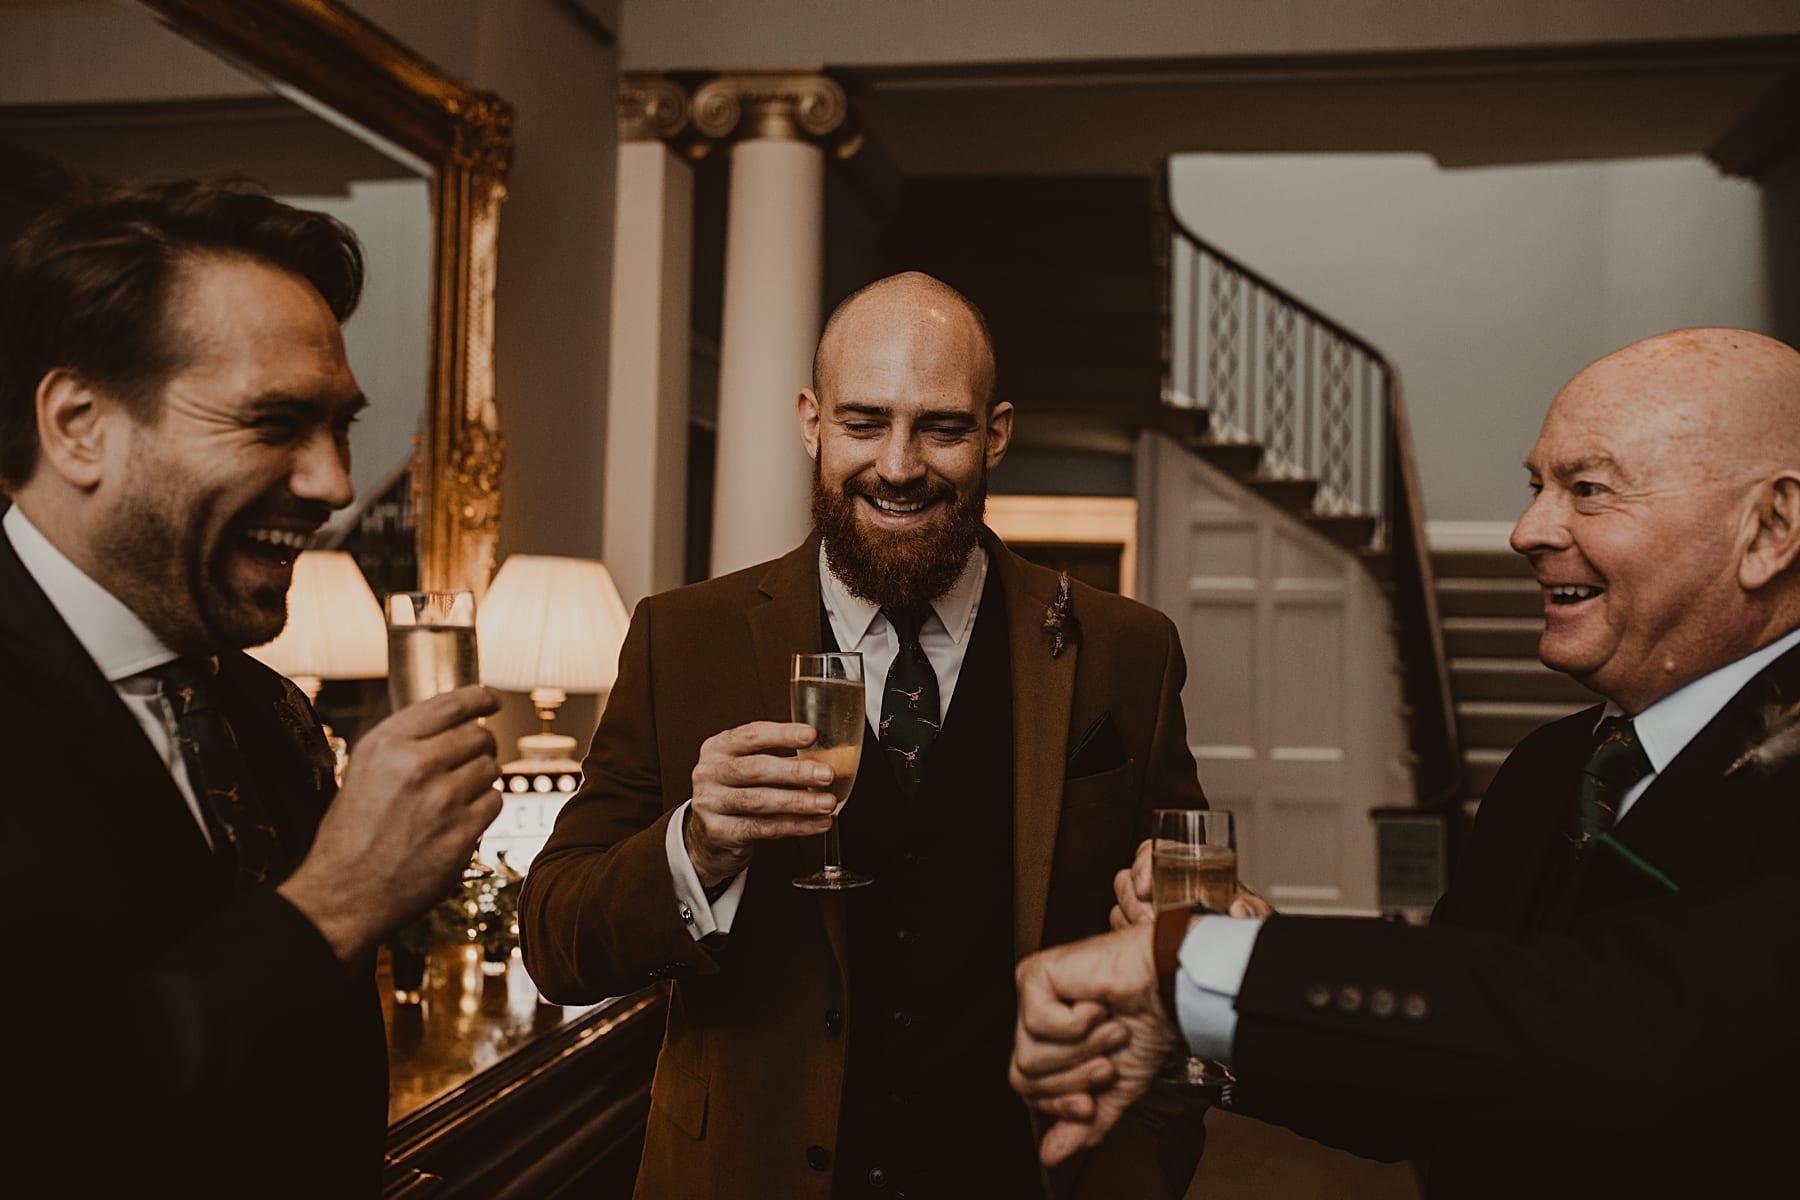 Guests enjoying a drink